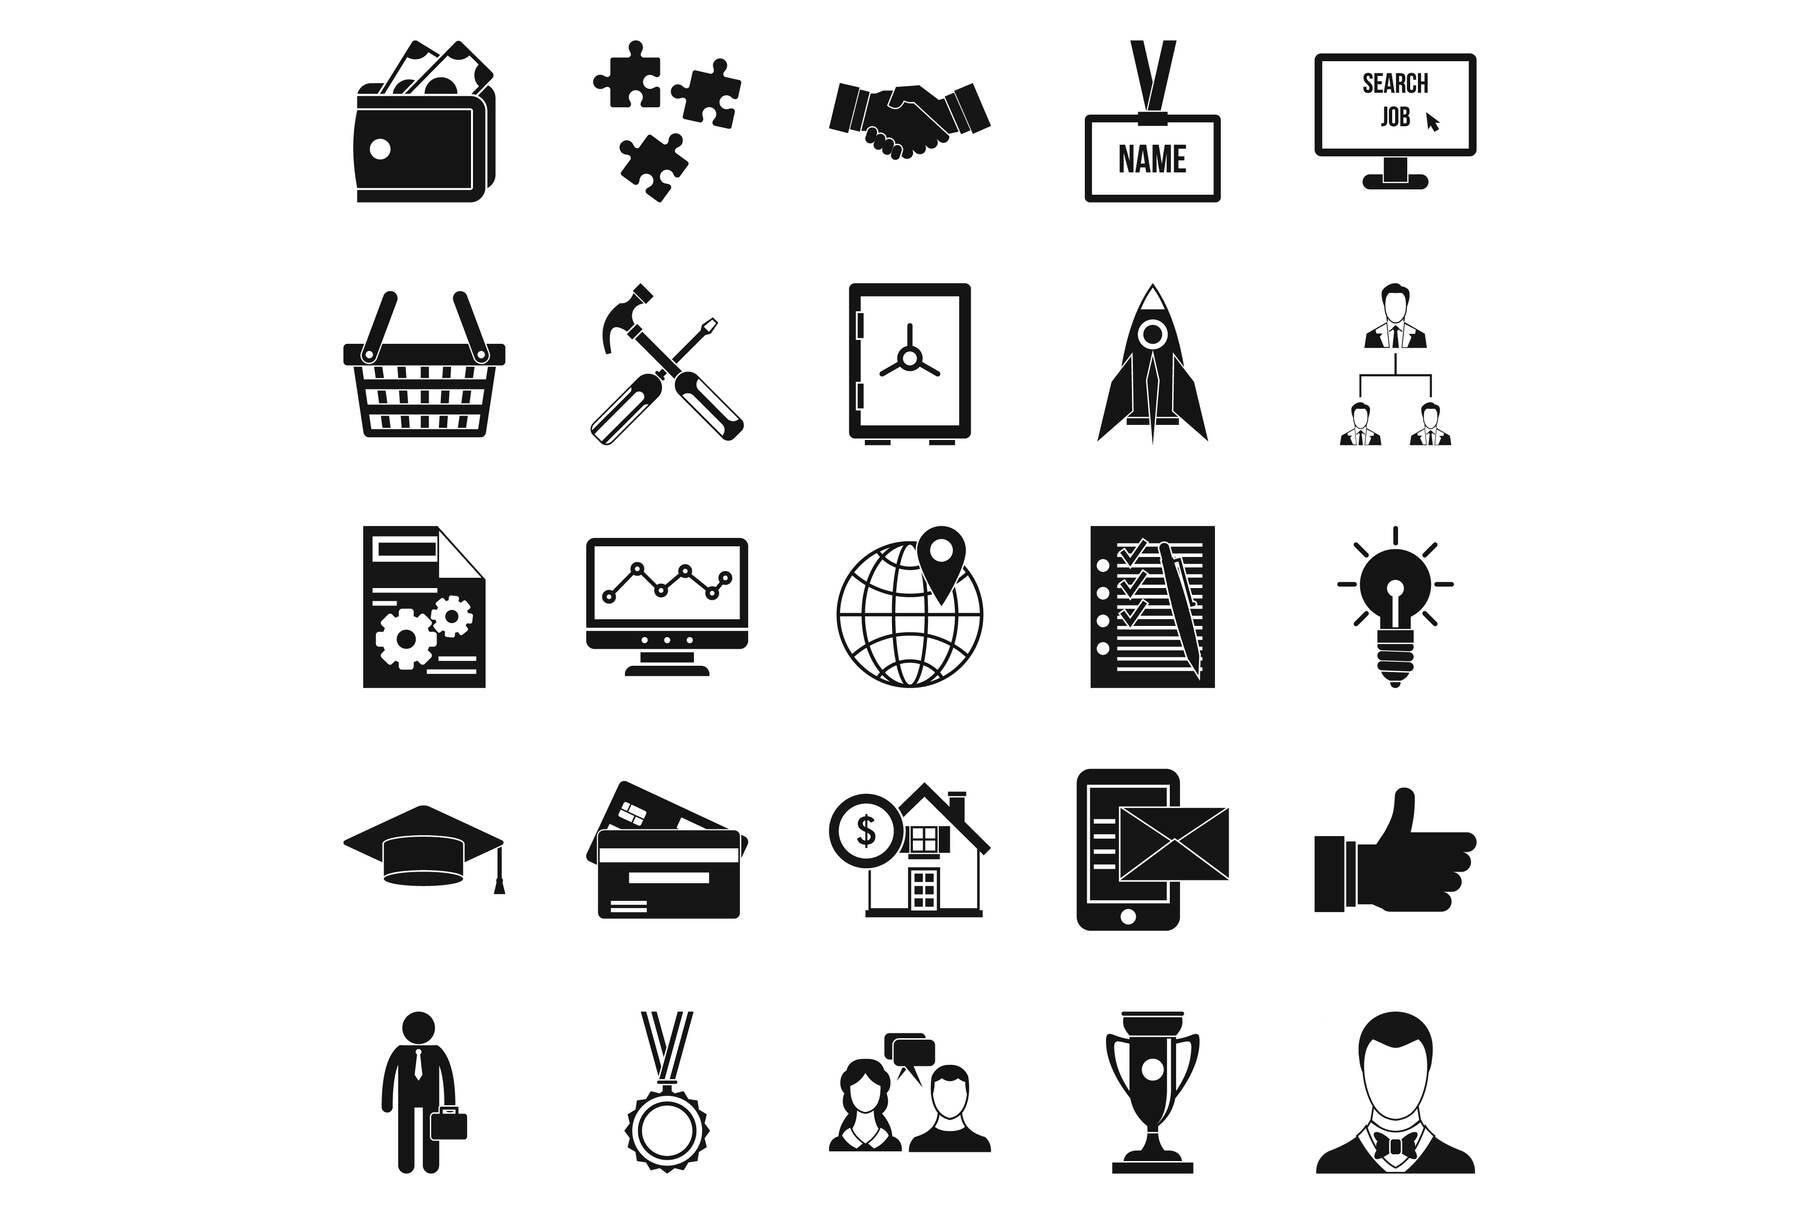 Bkg icons set, simple style example image 1